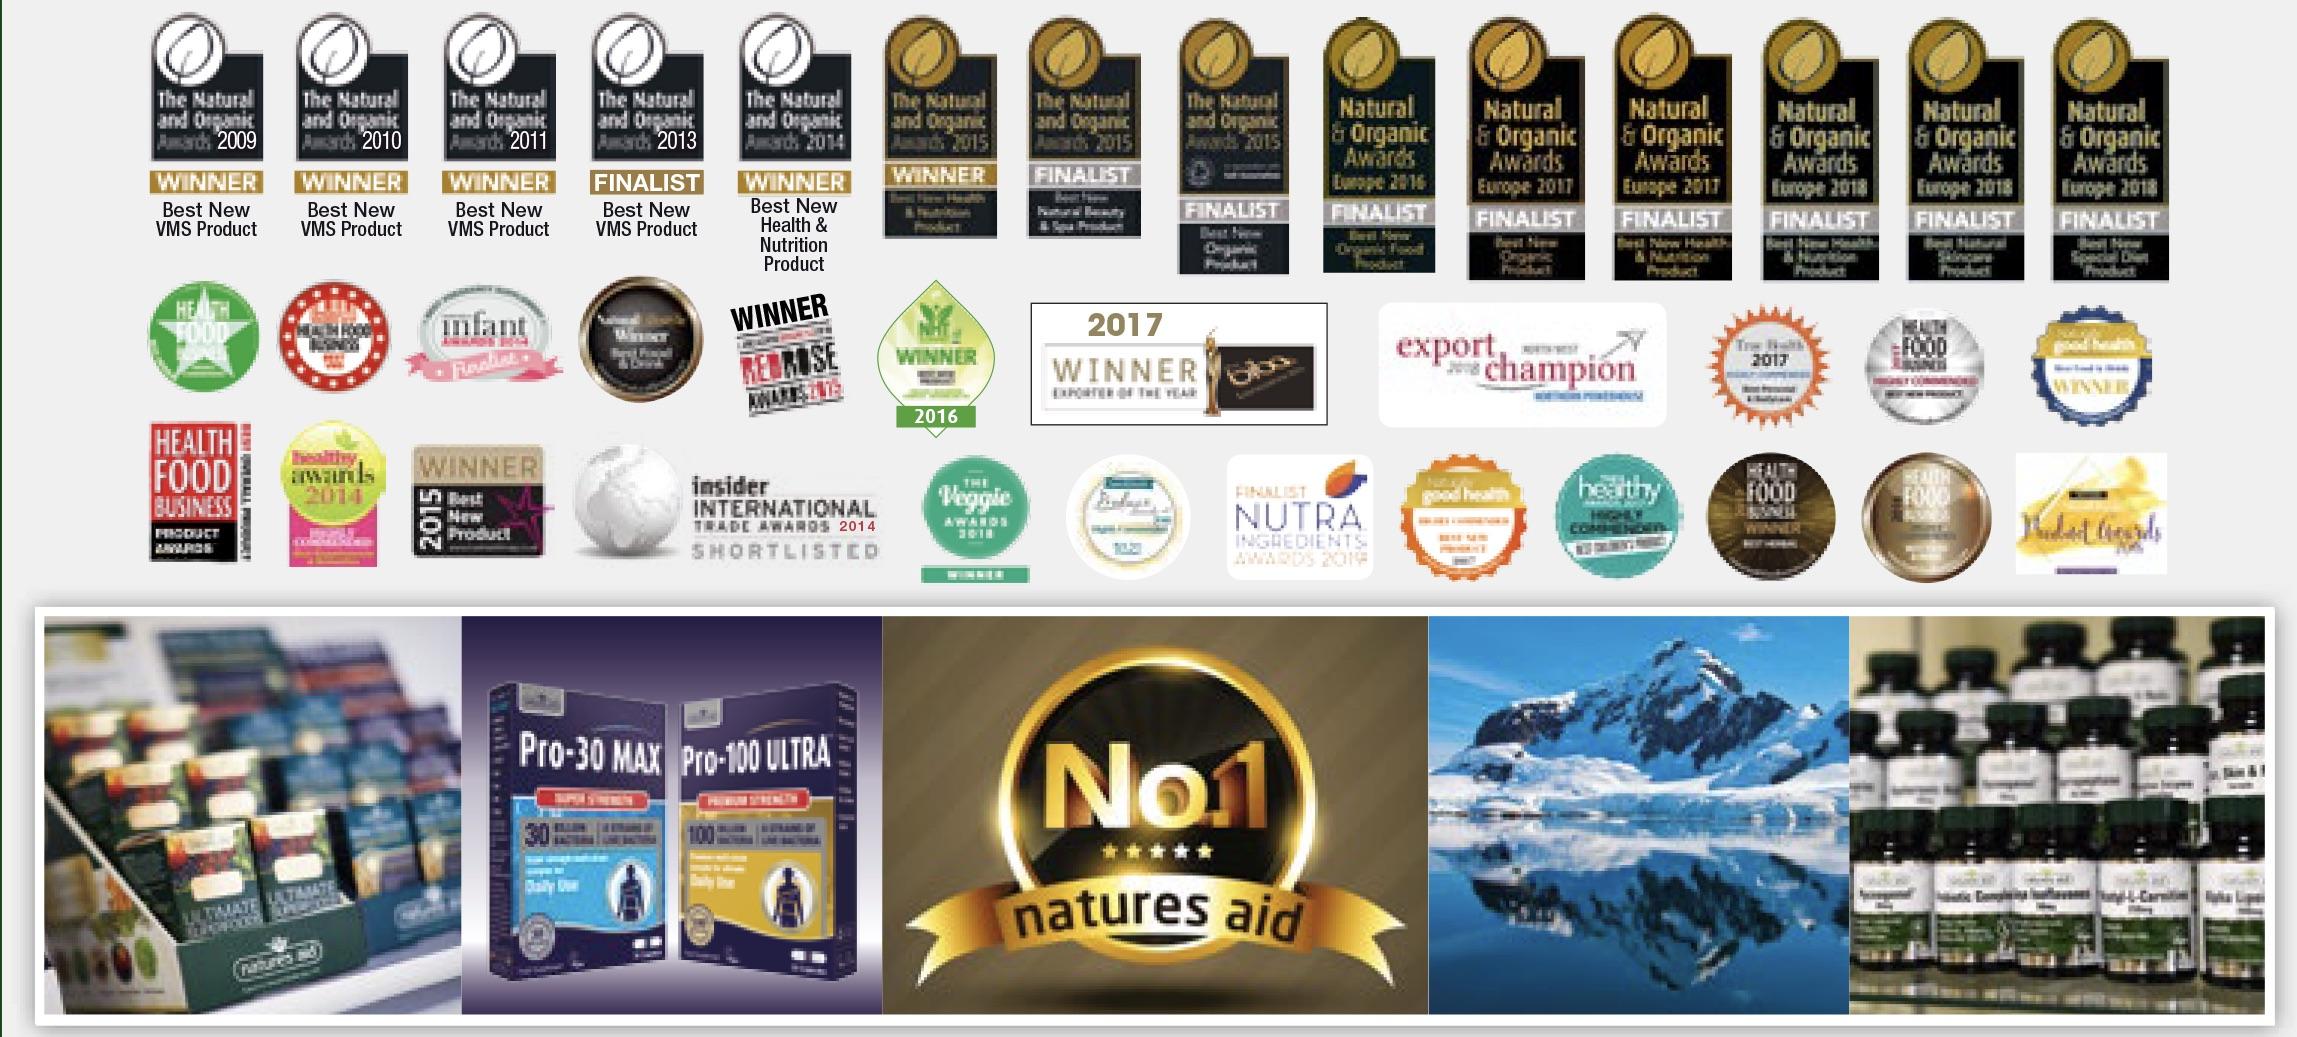 Ocenenie pre produkty Natures Aid